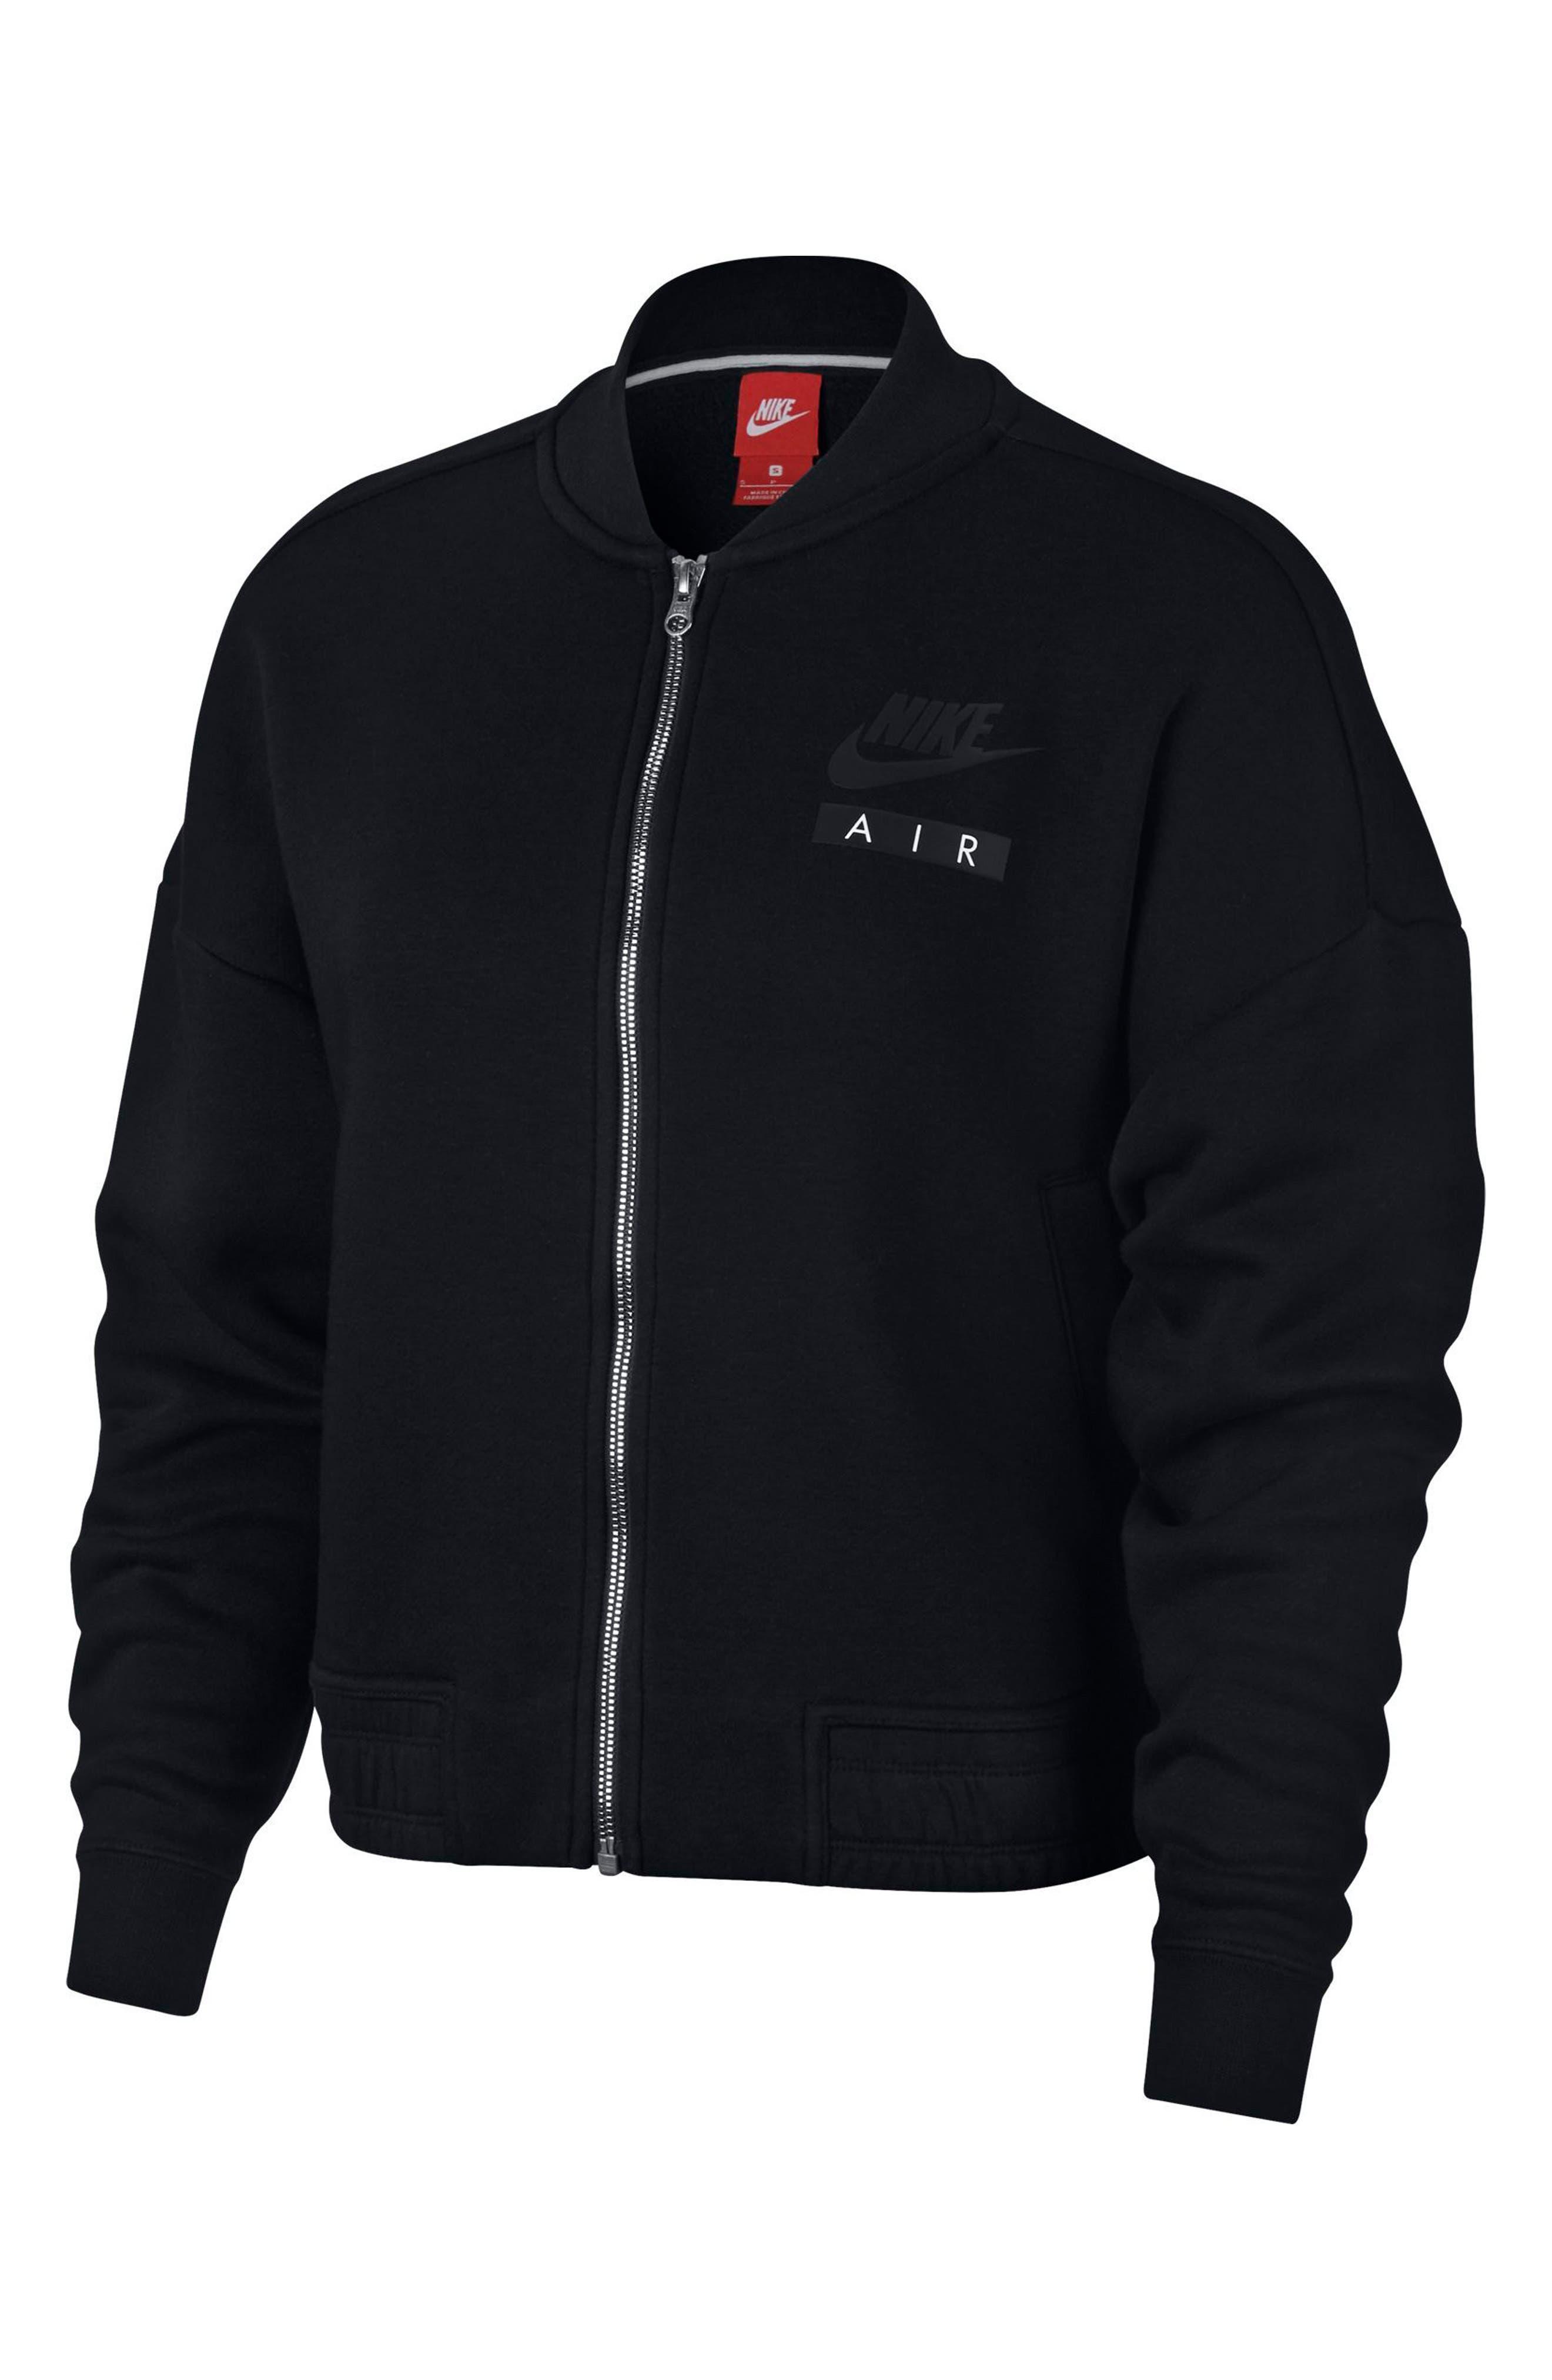 Sportswear Rally Jacket,                             Alternate thumbnail 4, color,                             Black/ Black/ Black